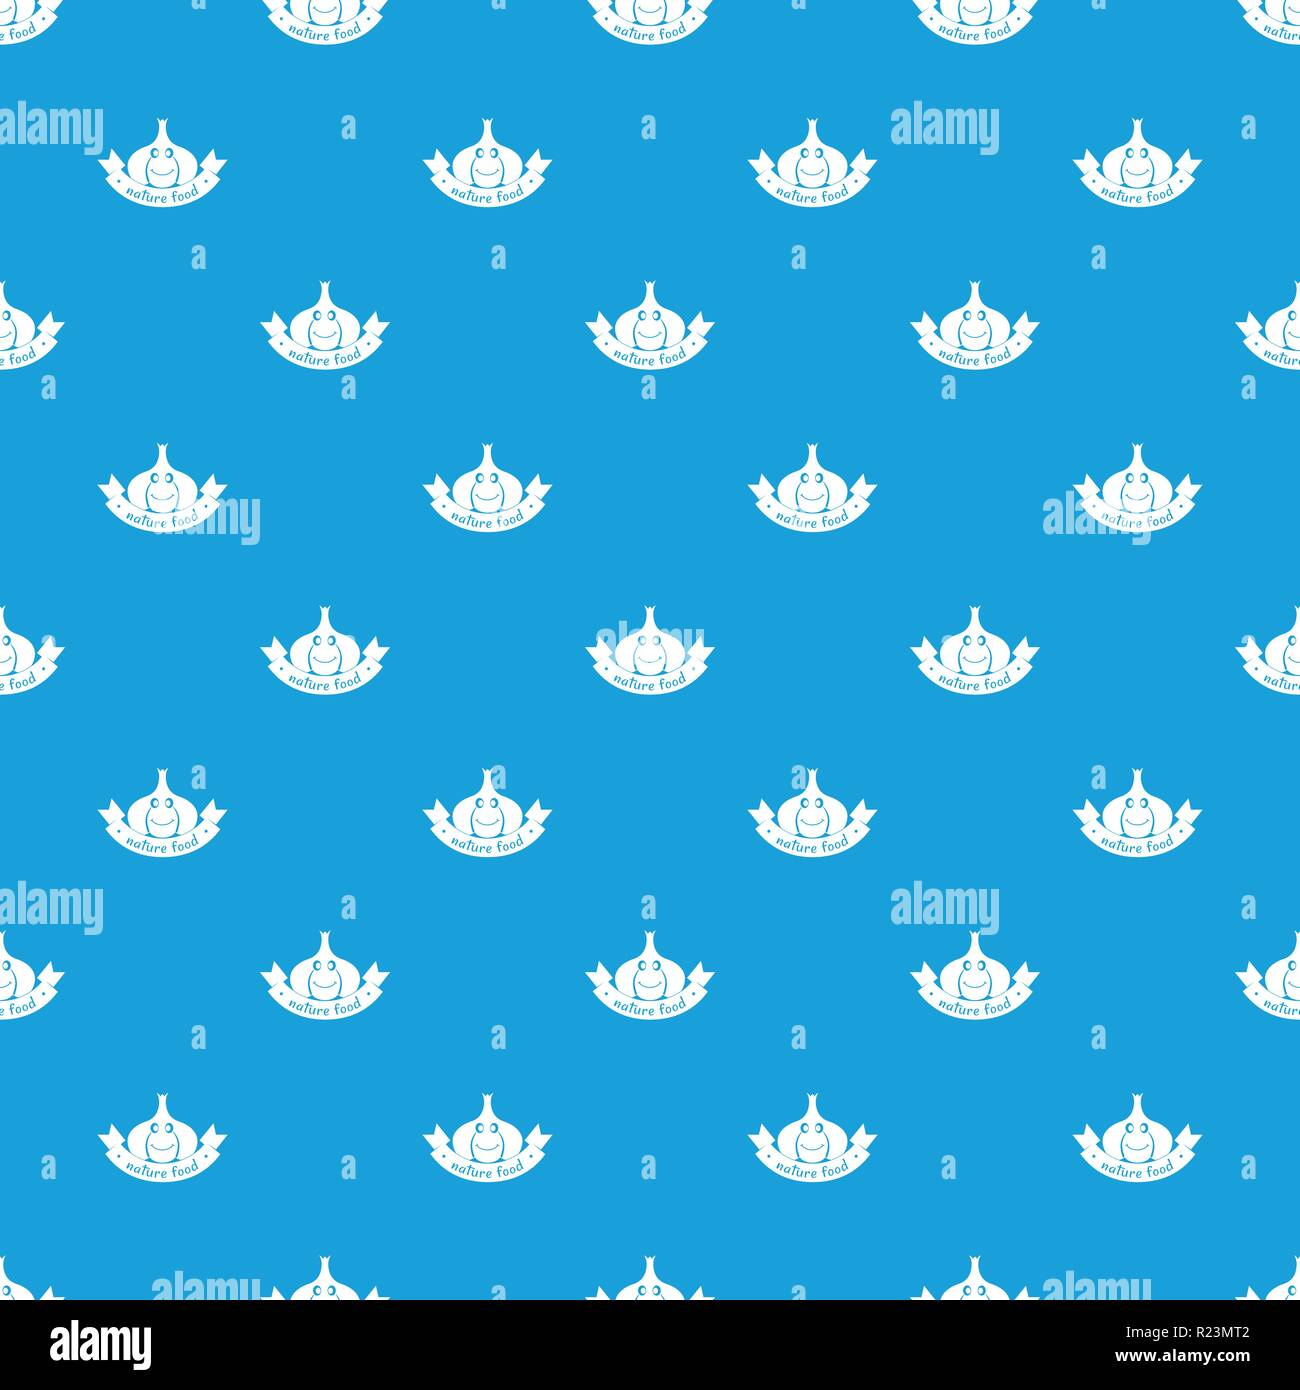 Knoblauch Muster nahtlose Vektor blau Stock Vektor